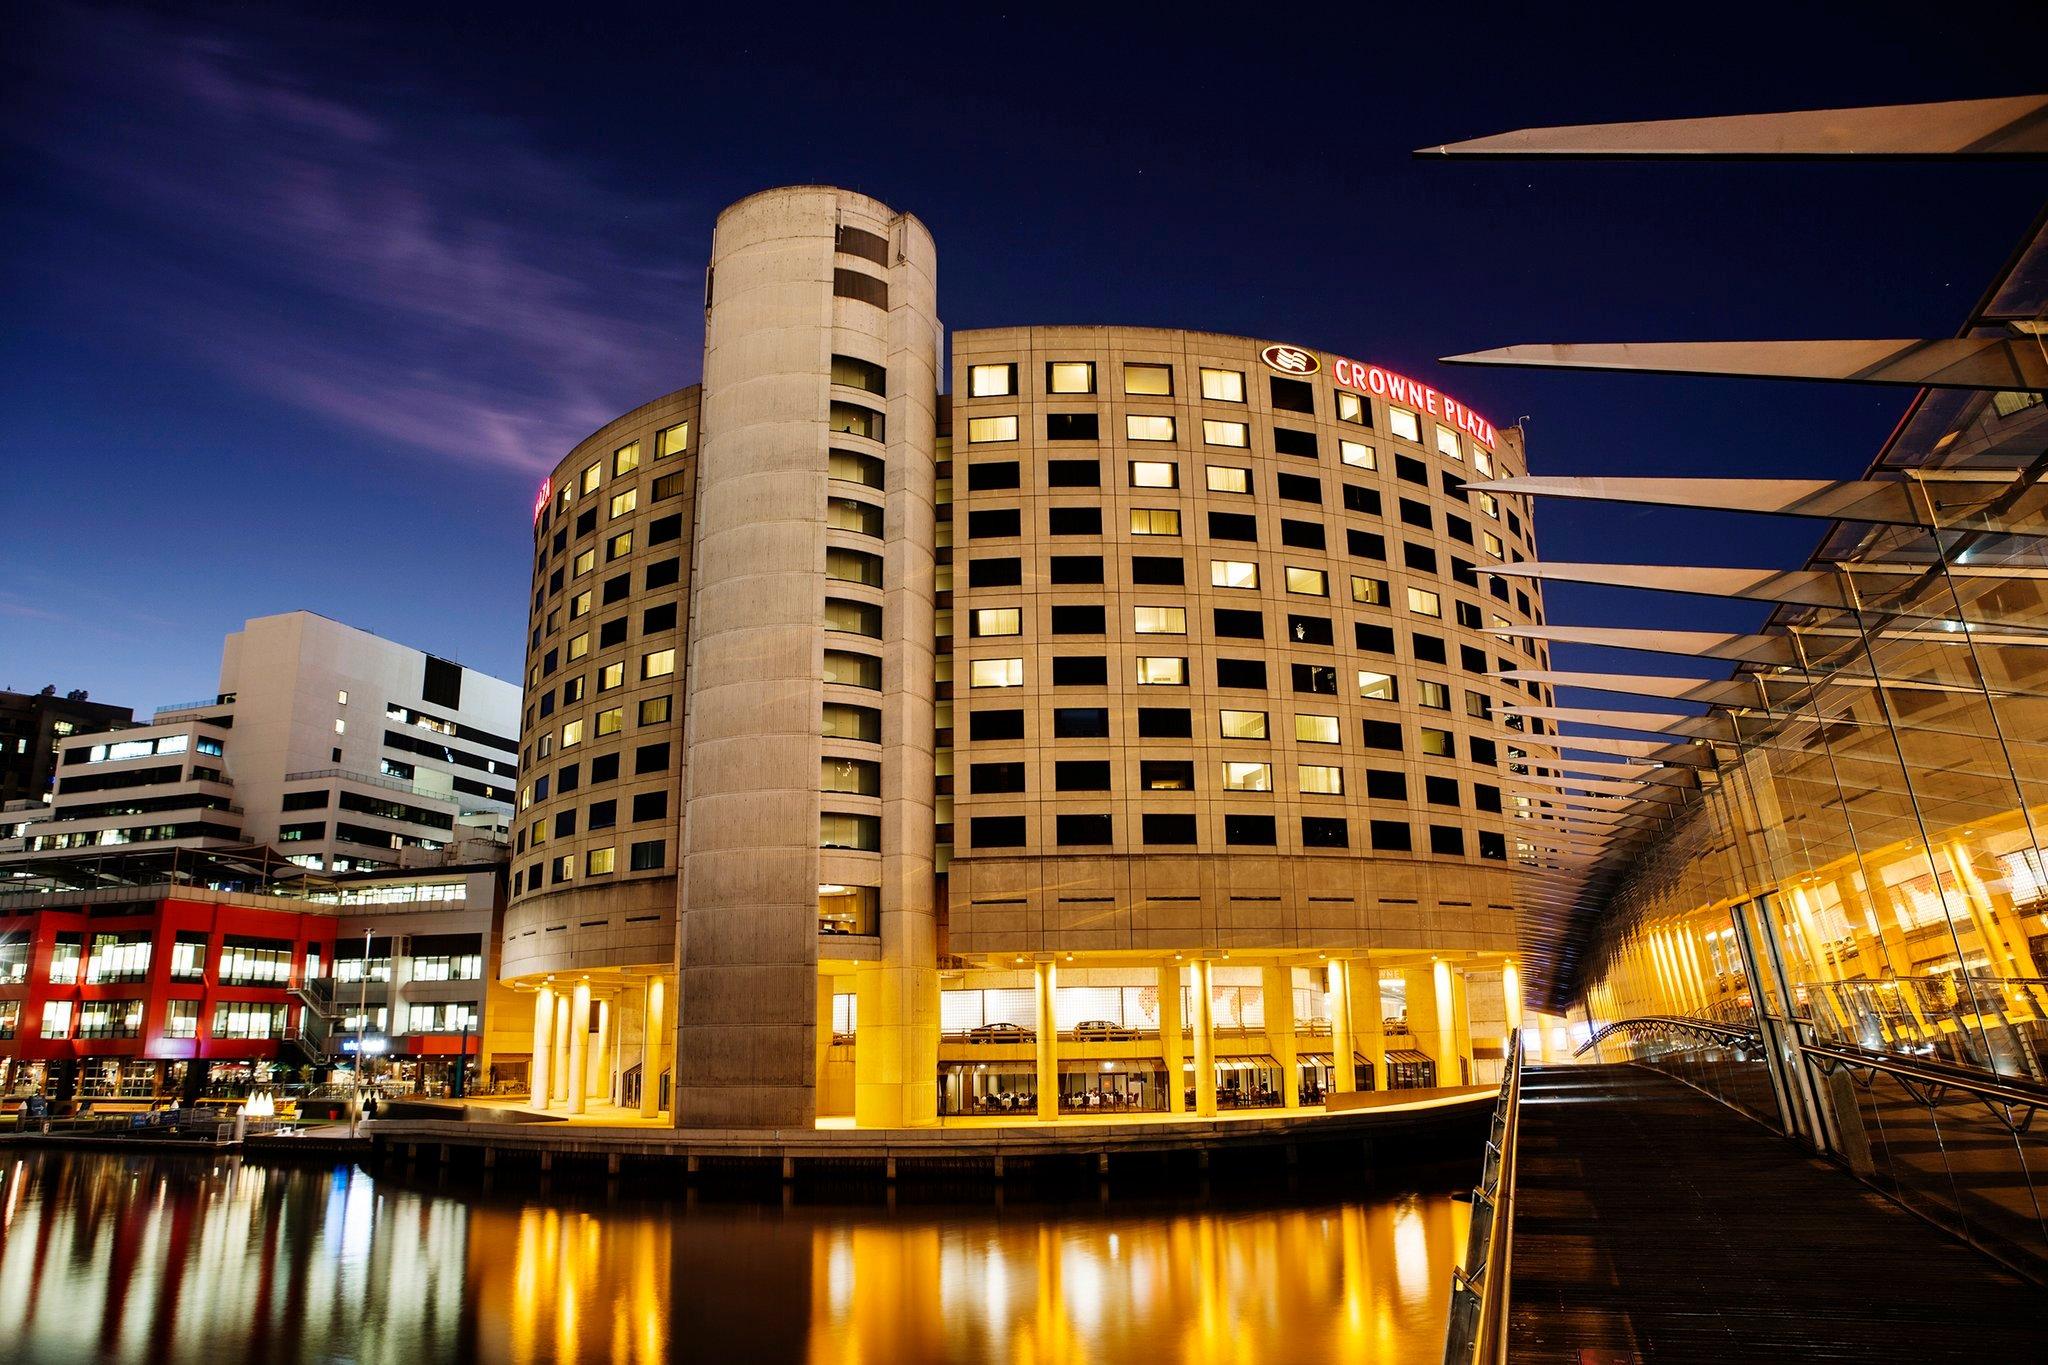 Crowne Plaza Melbourne Australia Hotel Reviews